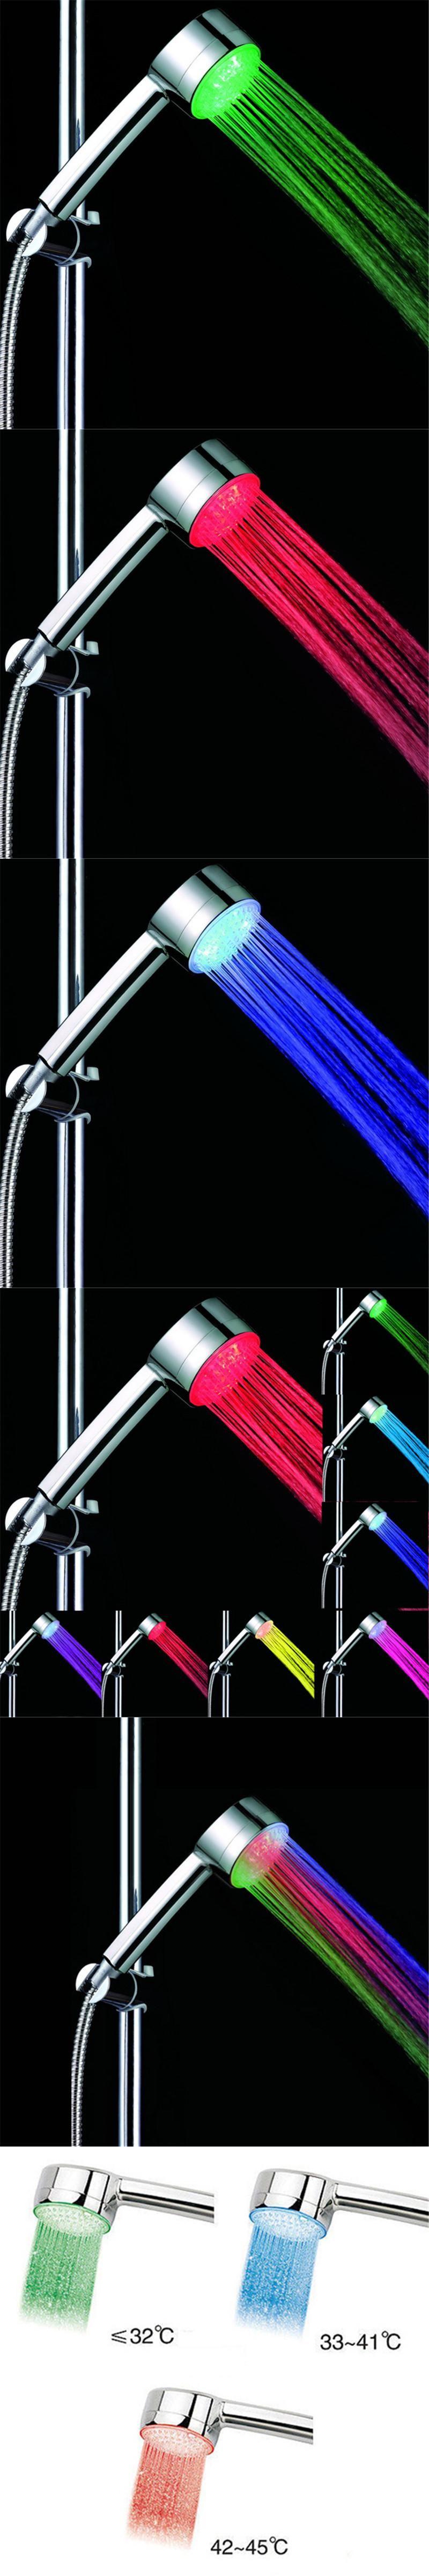 50 Pcs LED Shower Head Control Romantic Bathroom Shower Head,Temperature  Control 3 Color Light